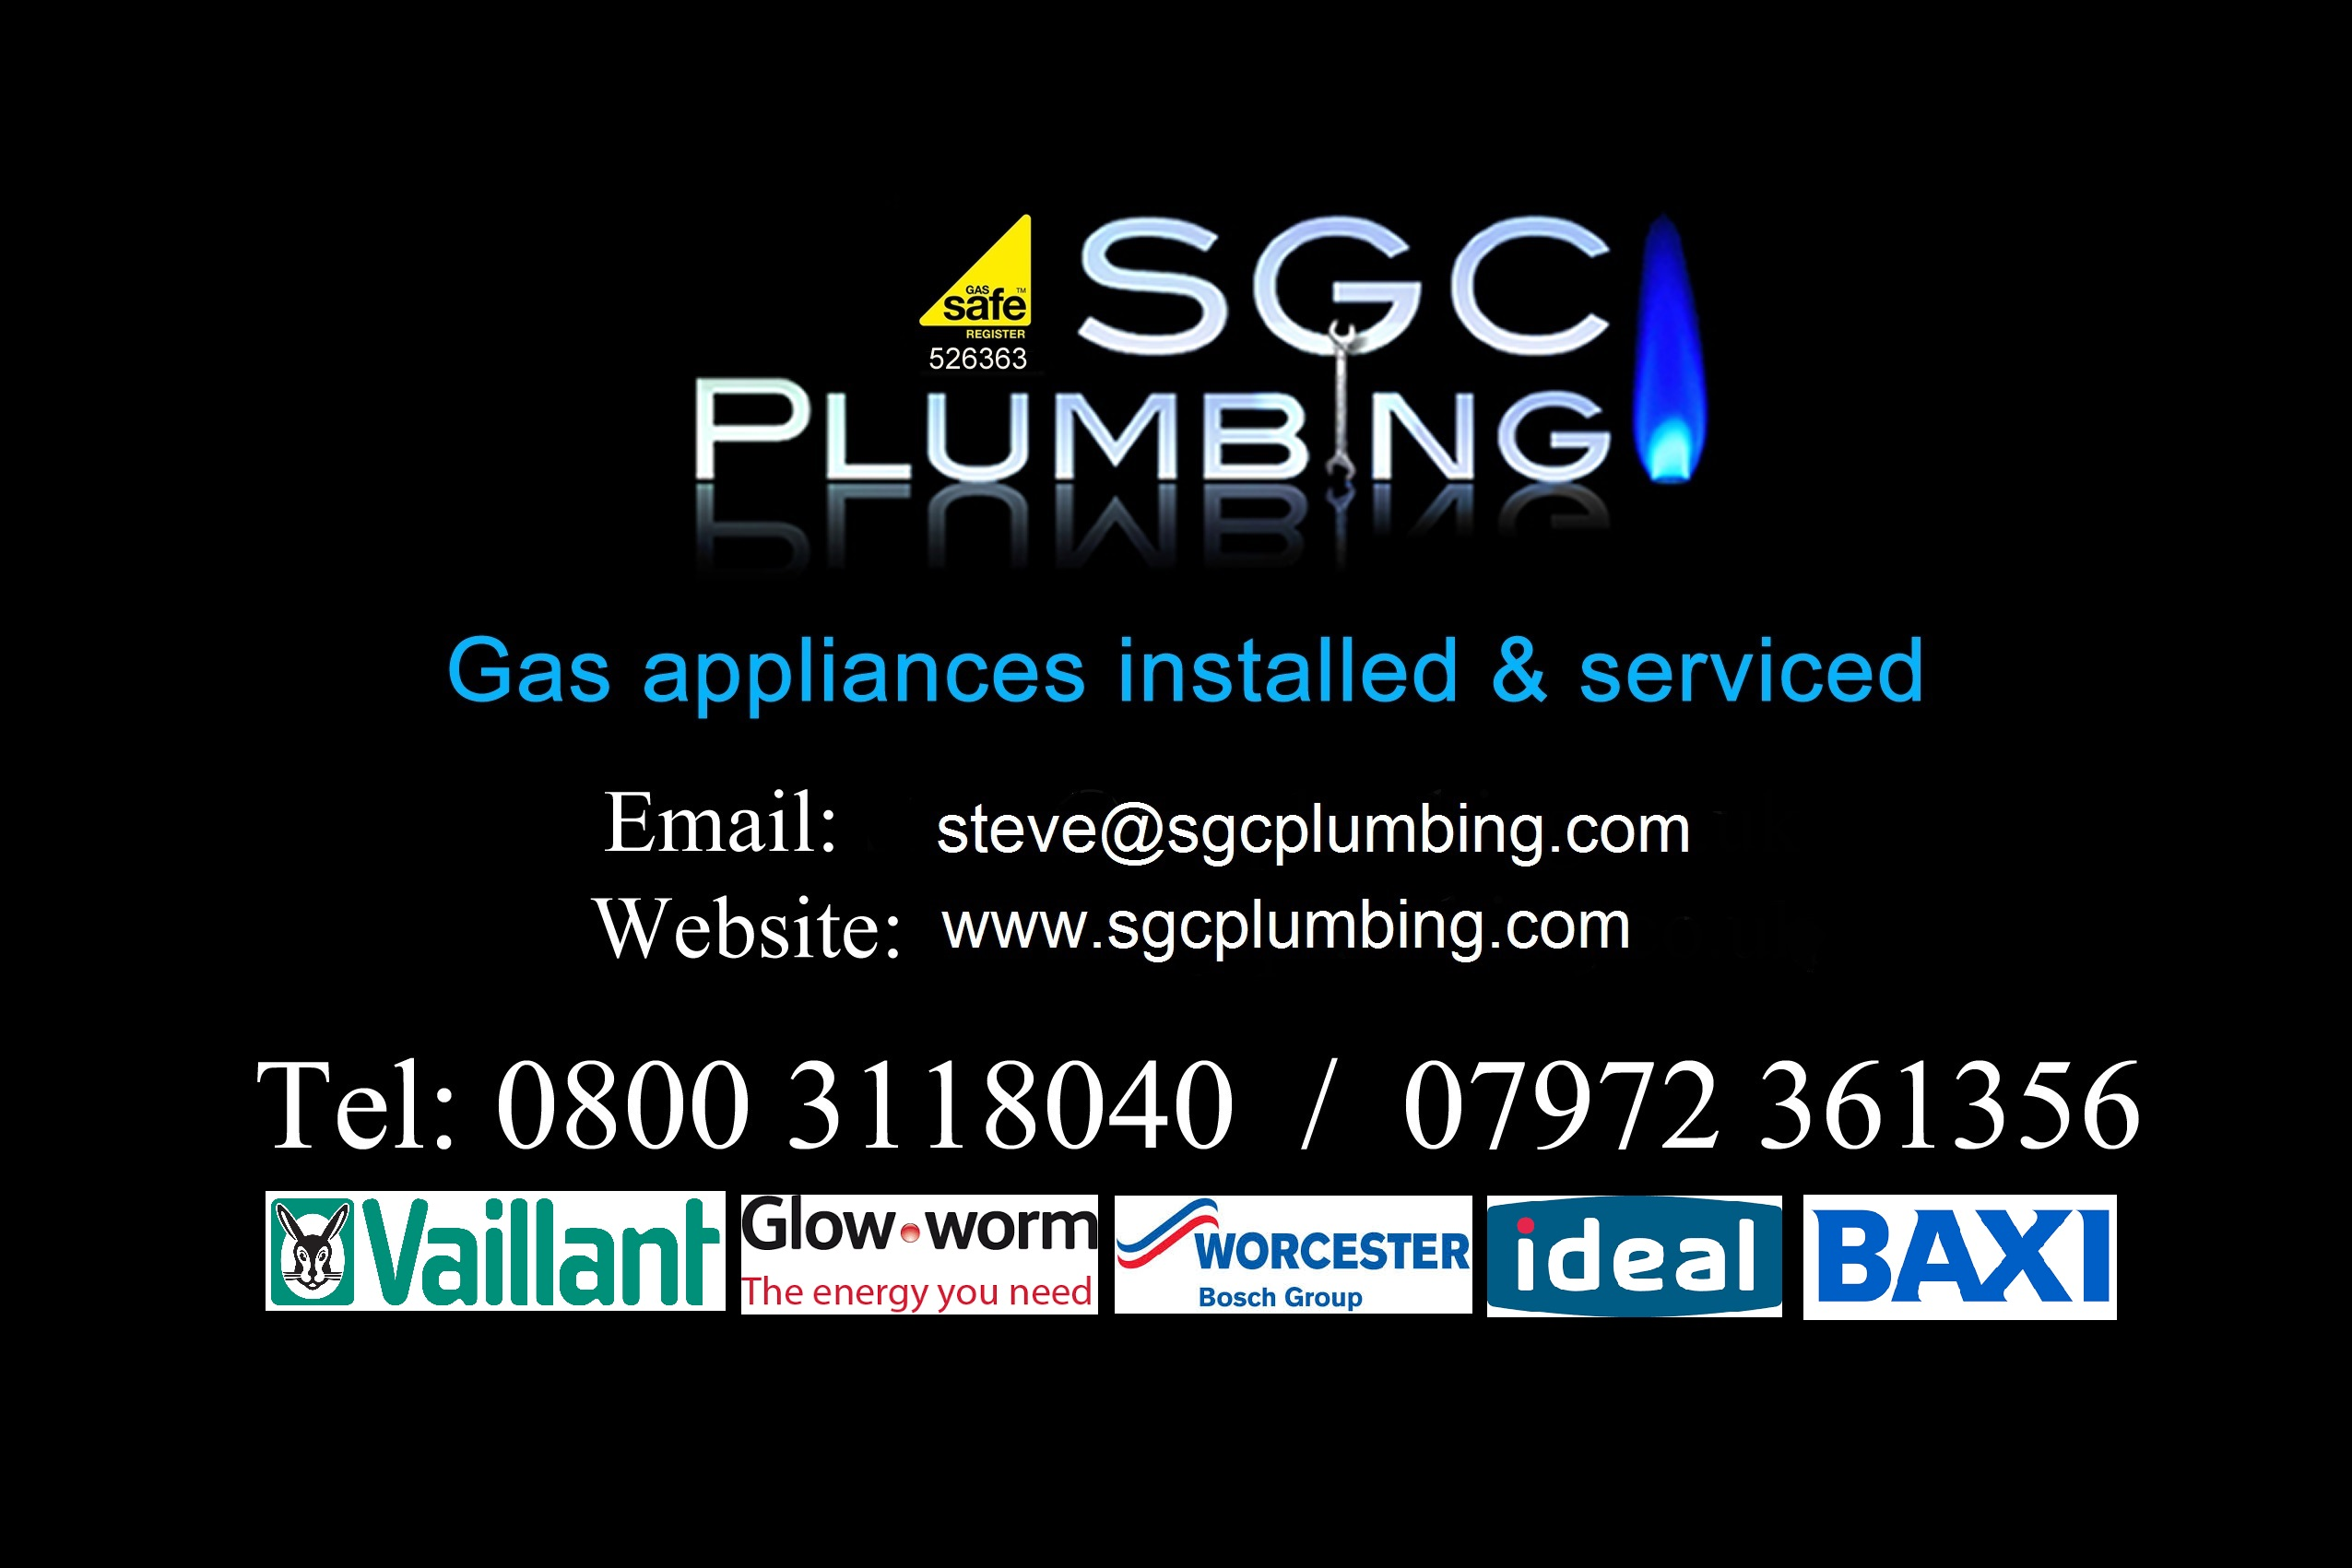 SGC Plumbing Ltd